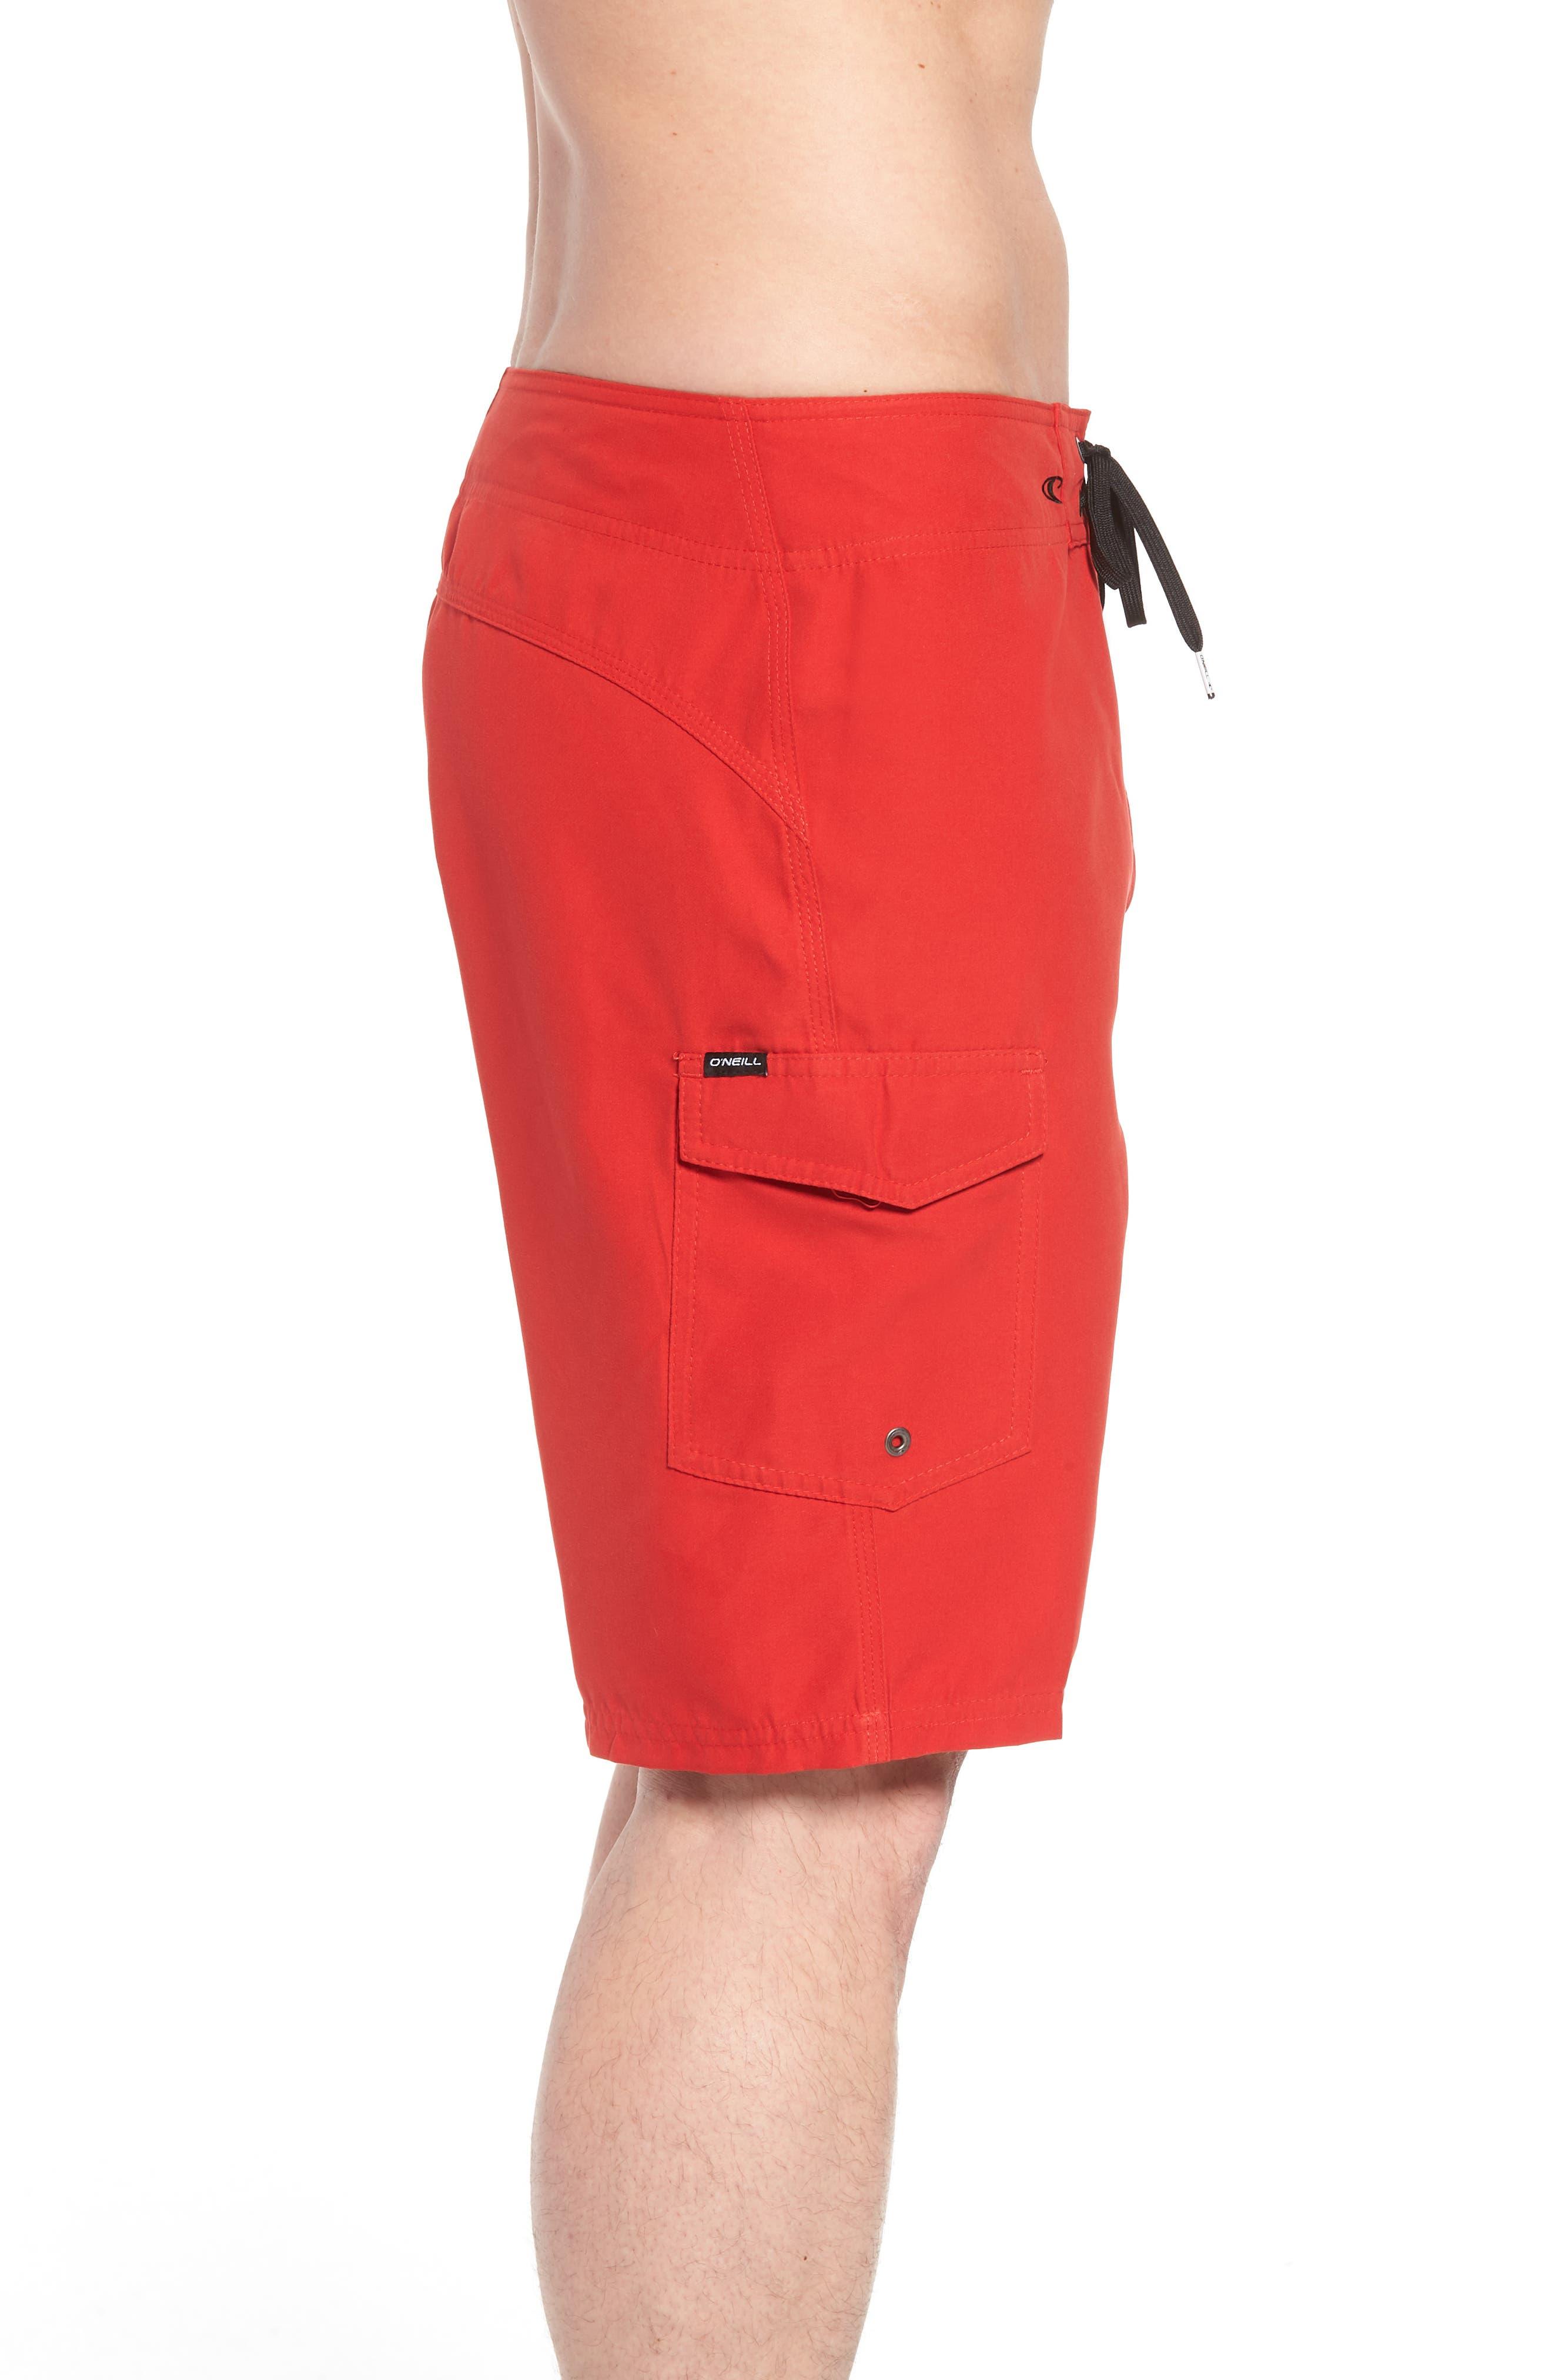 Santa Cruz Board Shorts,                             Alternate thumbnail 4, color,                             Red